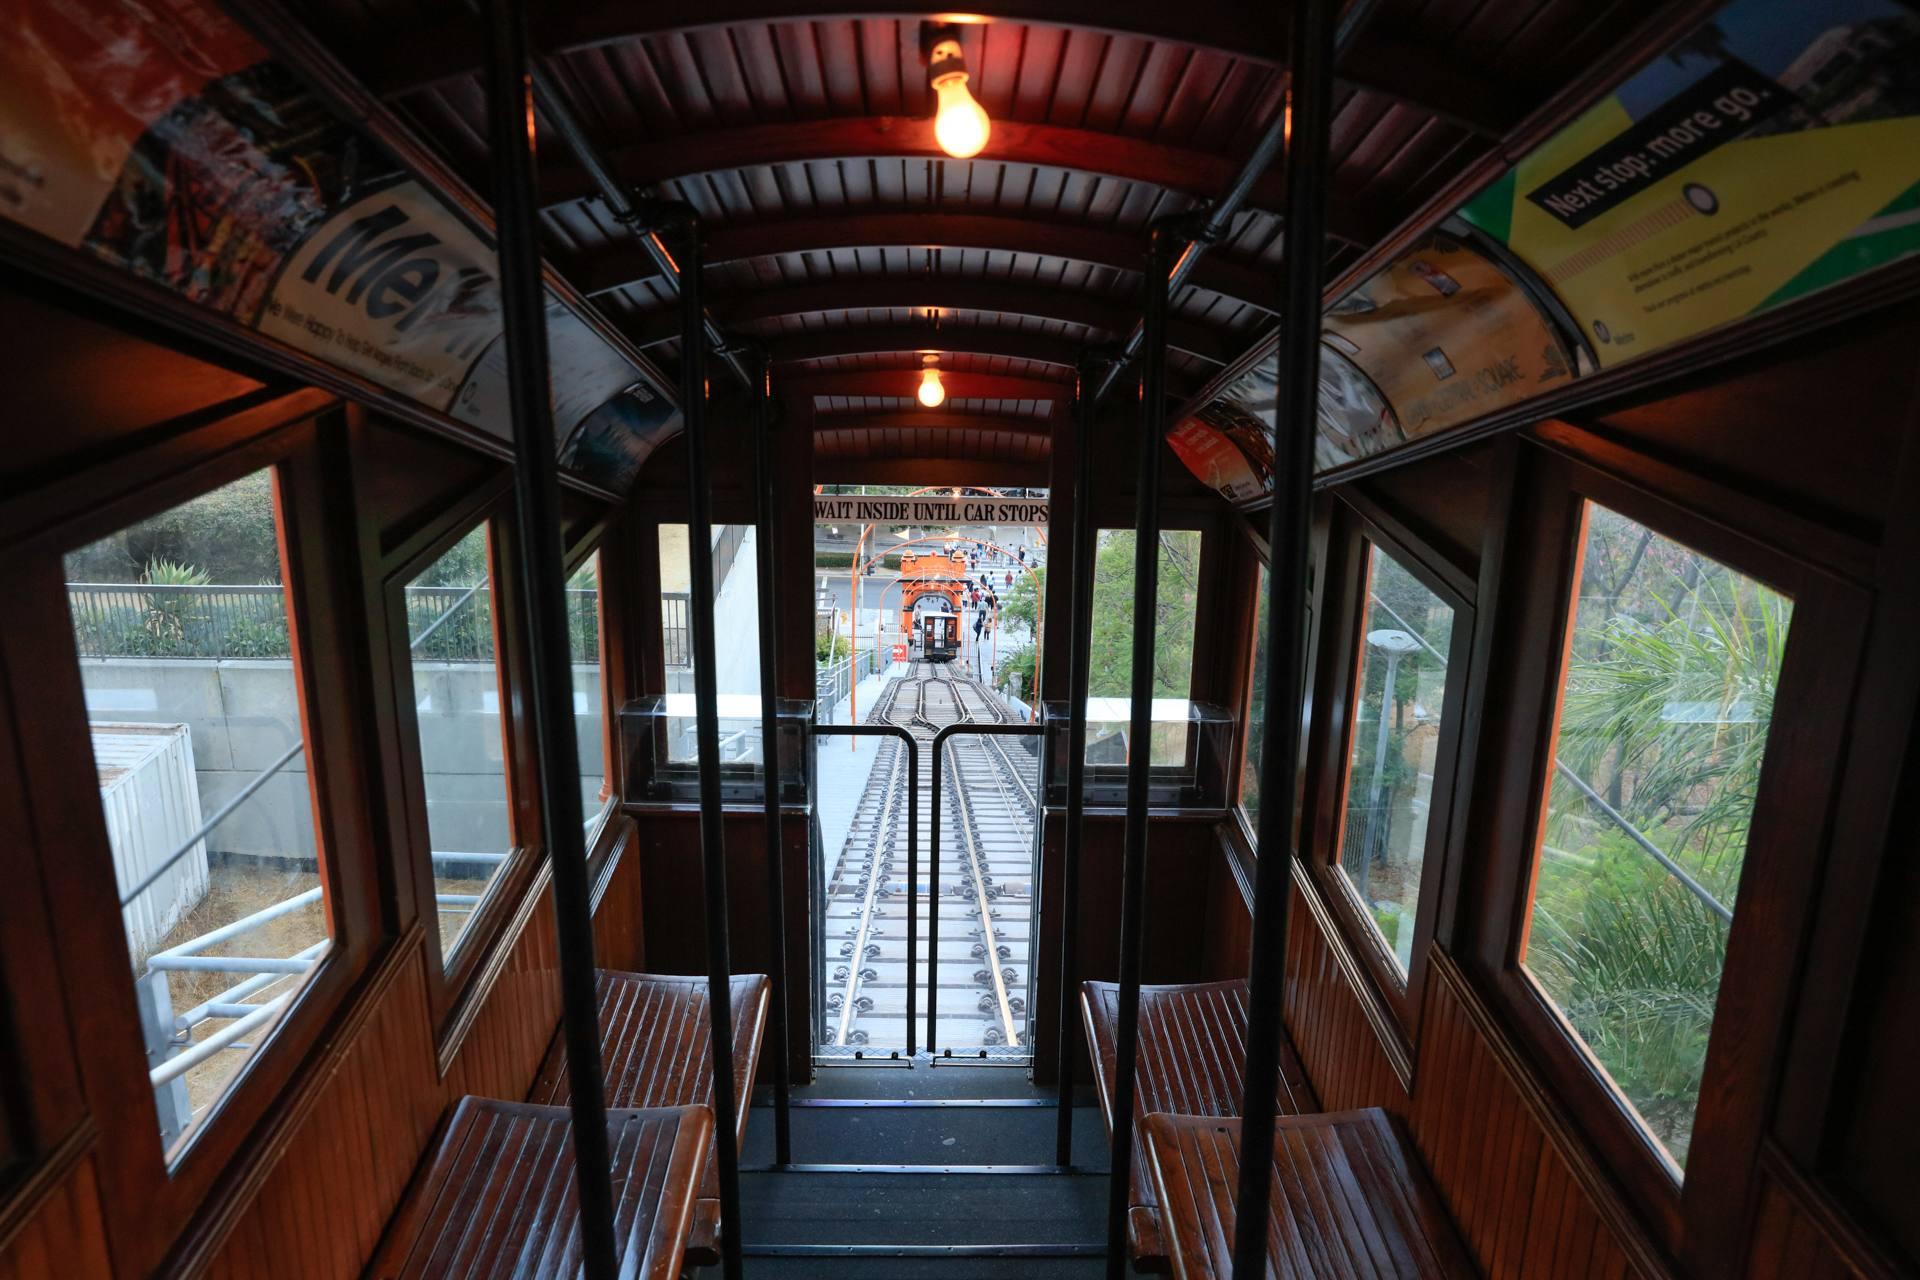 Angels Flight Railway car interior